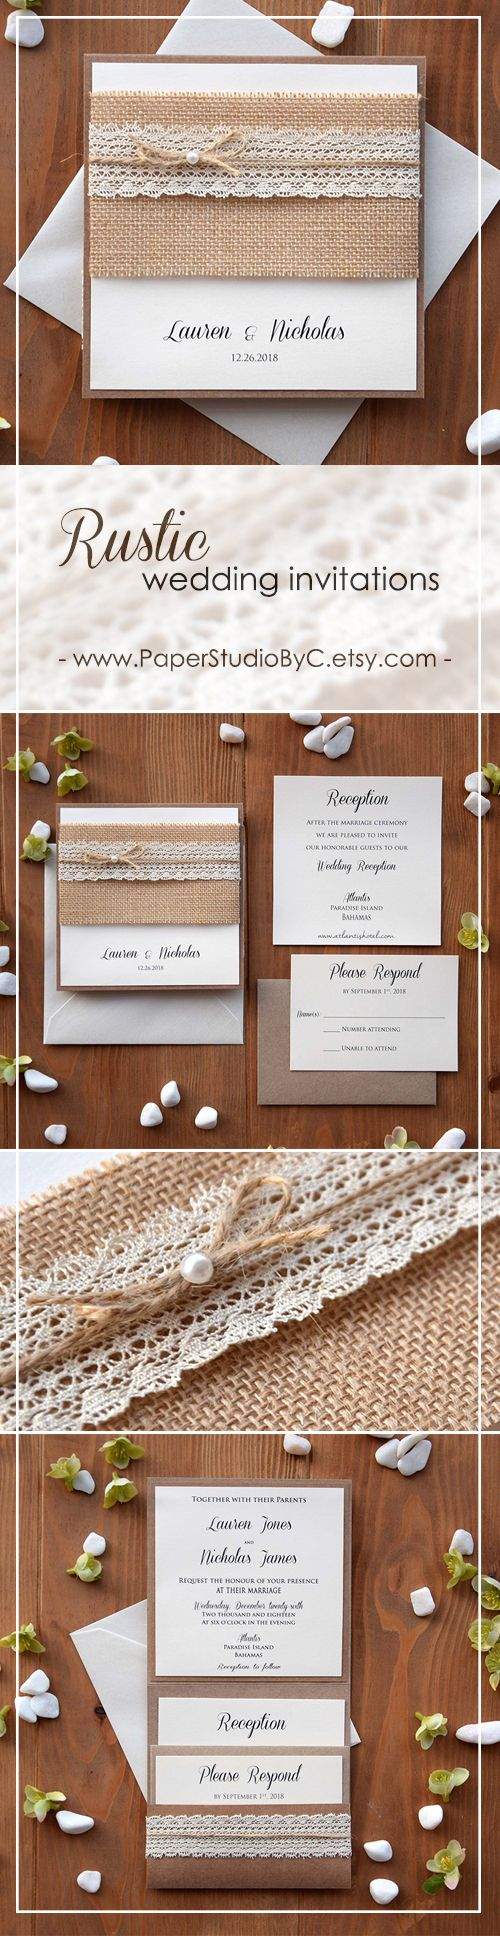 Burlap and Lace Wedding Invitations | Pocket invitation, Invitation ...